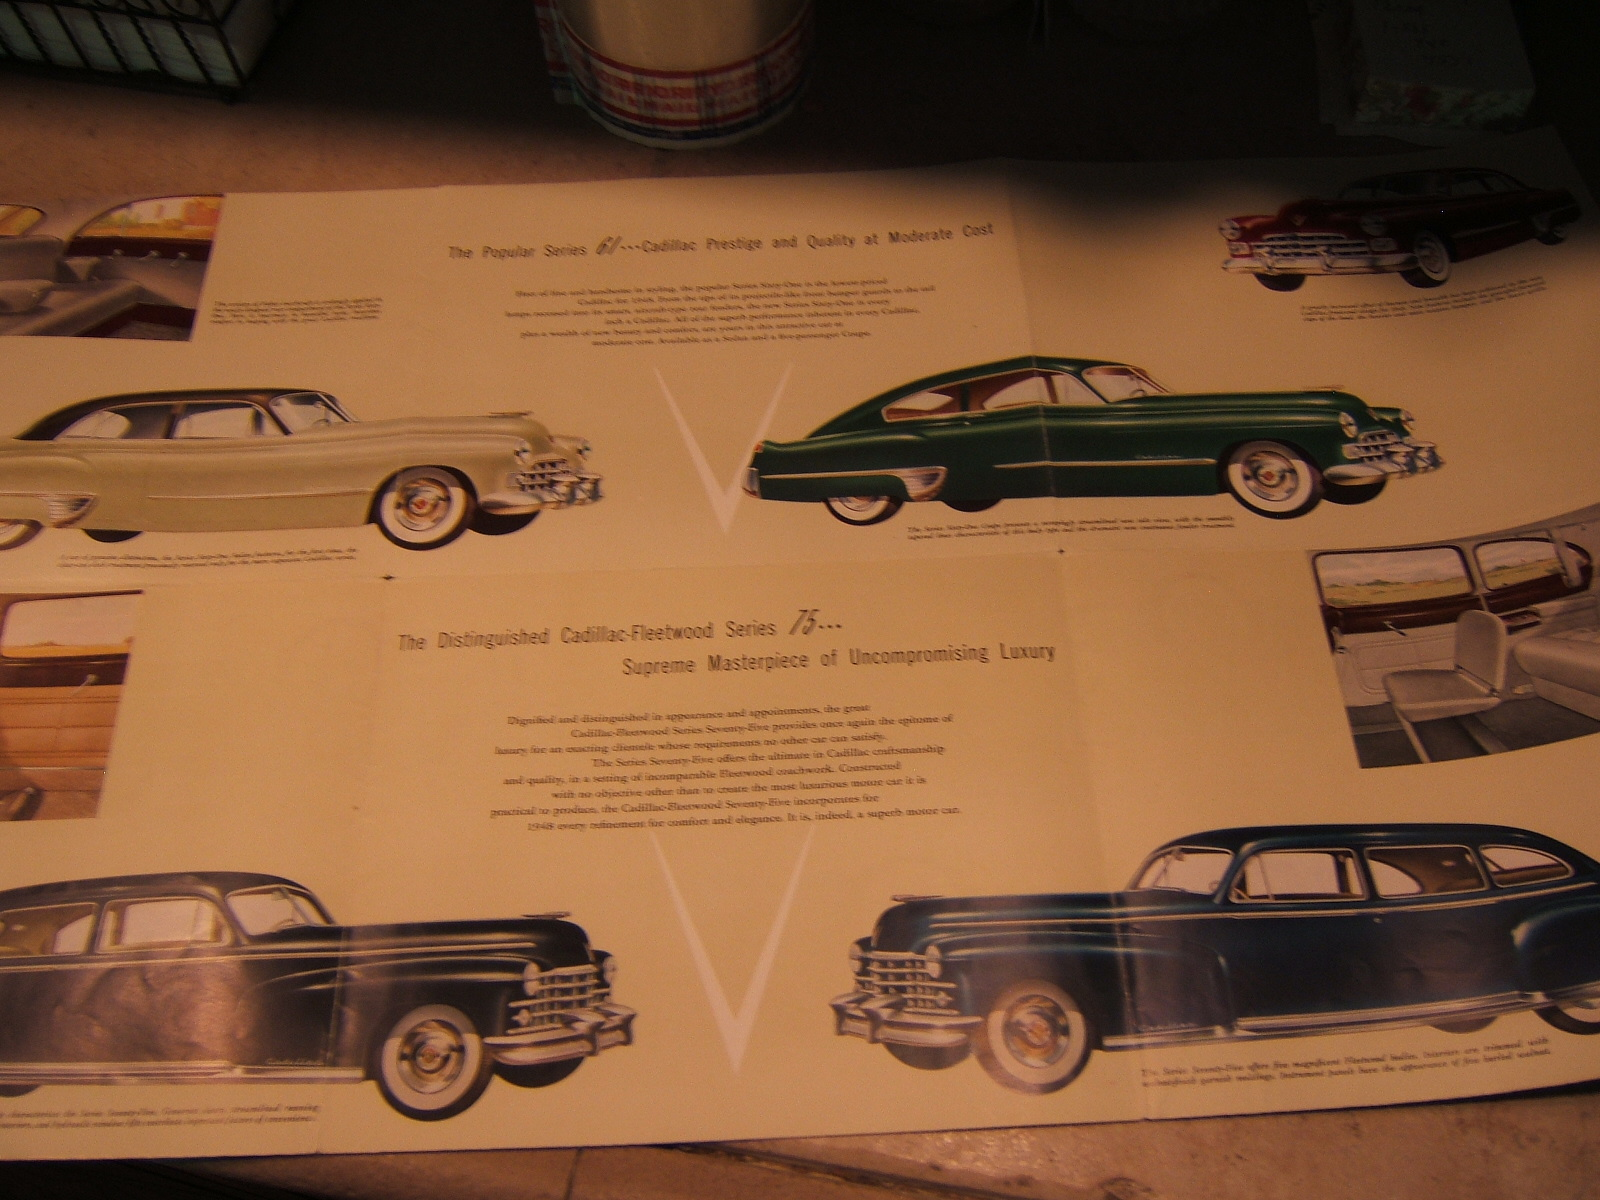 1948 Cadillac sales brochure (a 48 cadillac)